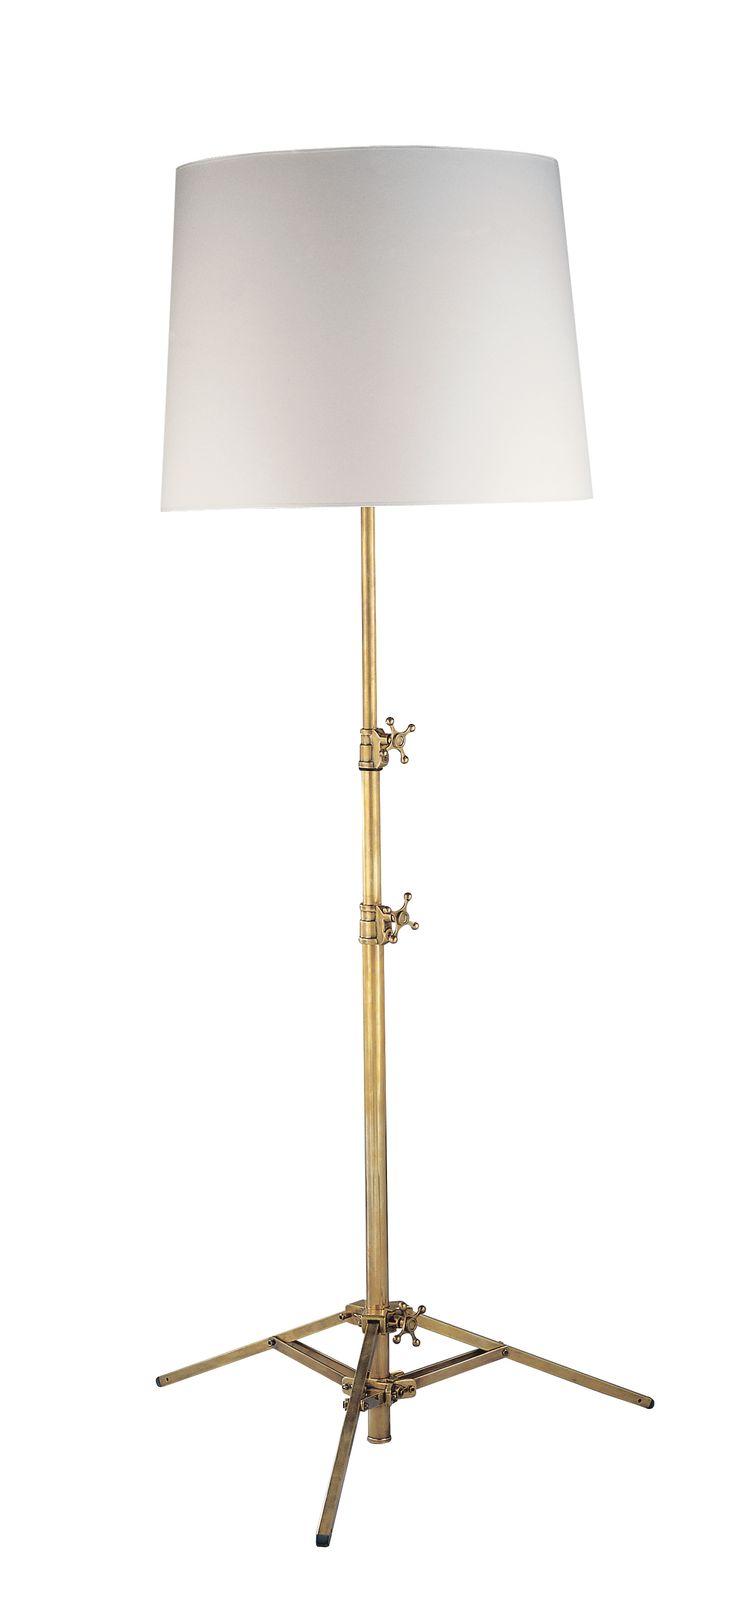 STUDIO ADJUSTABLE FLOOR LAMP WITH LARGE SHADE